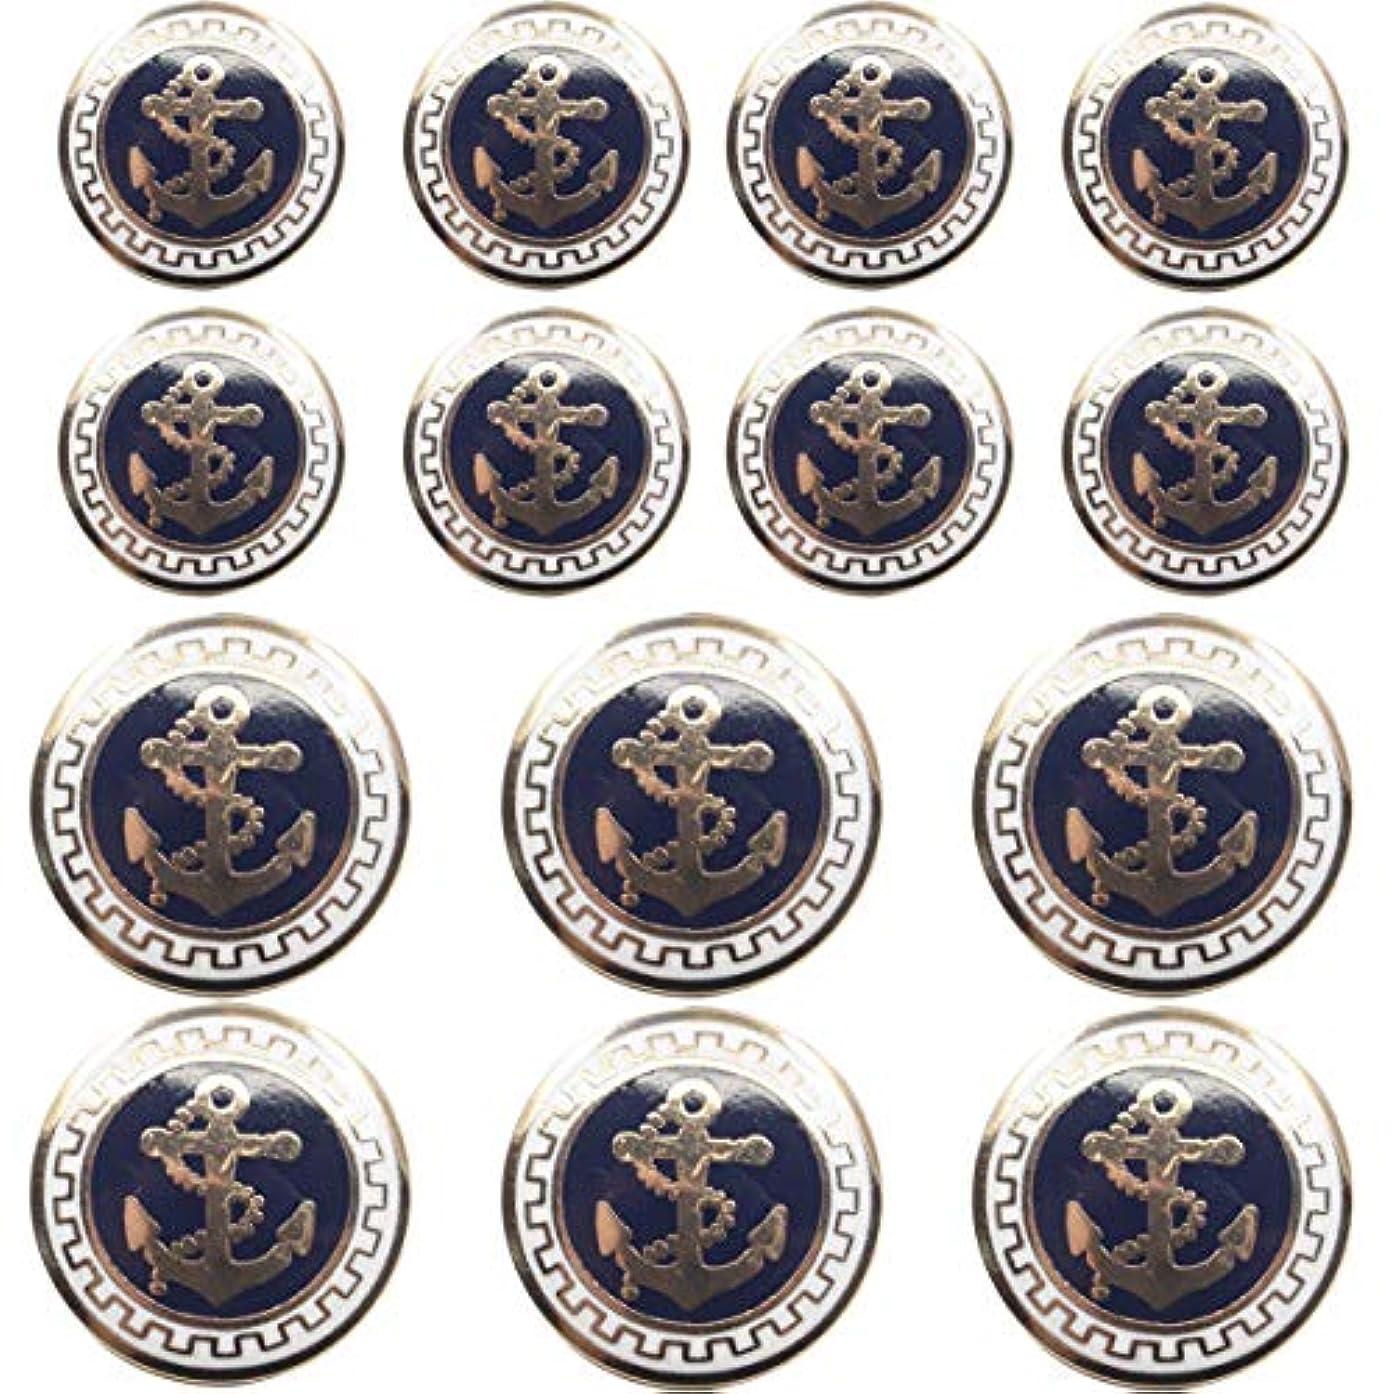 14 Piece Vintage Golden Metal Blazer Button Set - Naval Anchor - for Blazer, Sport Coat, Uniform, Jacket